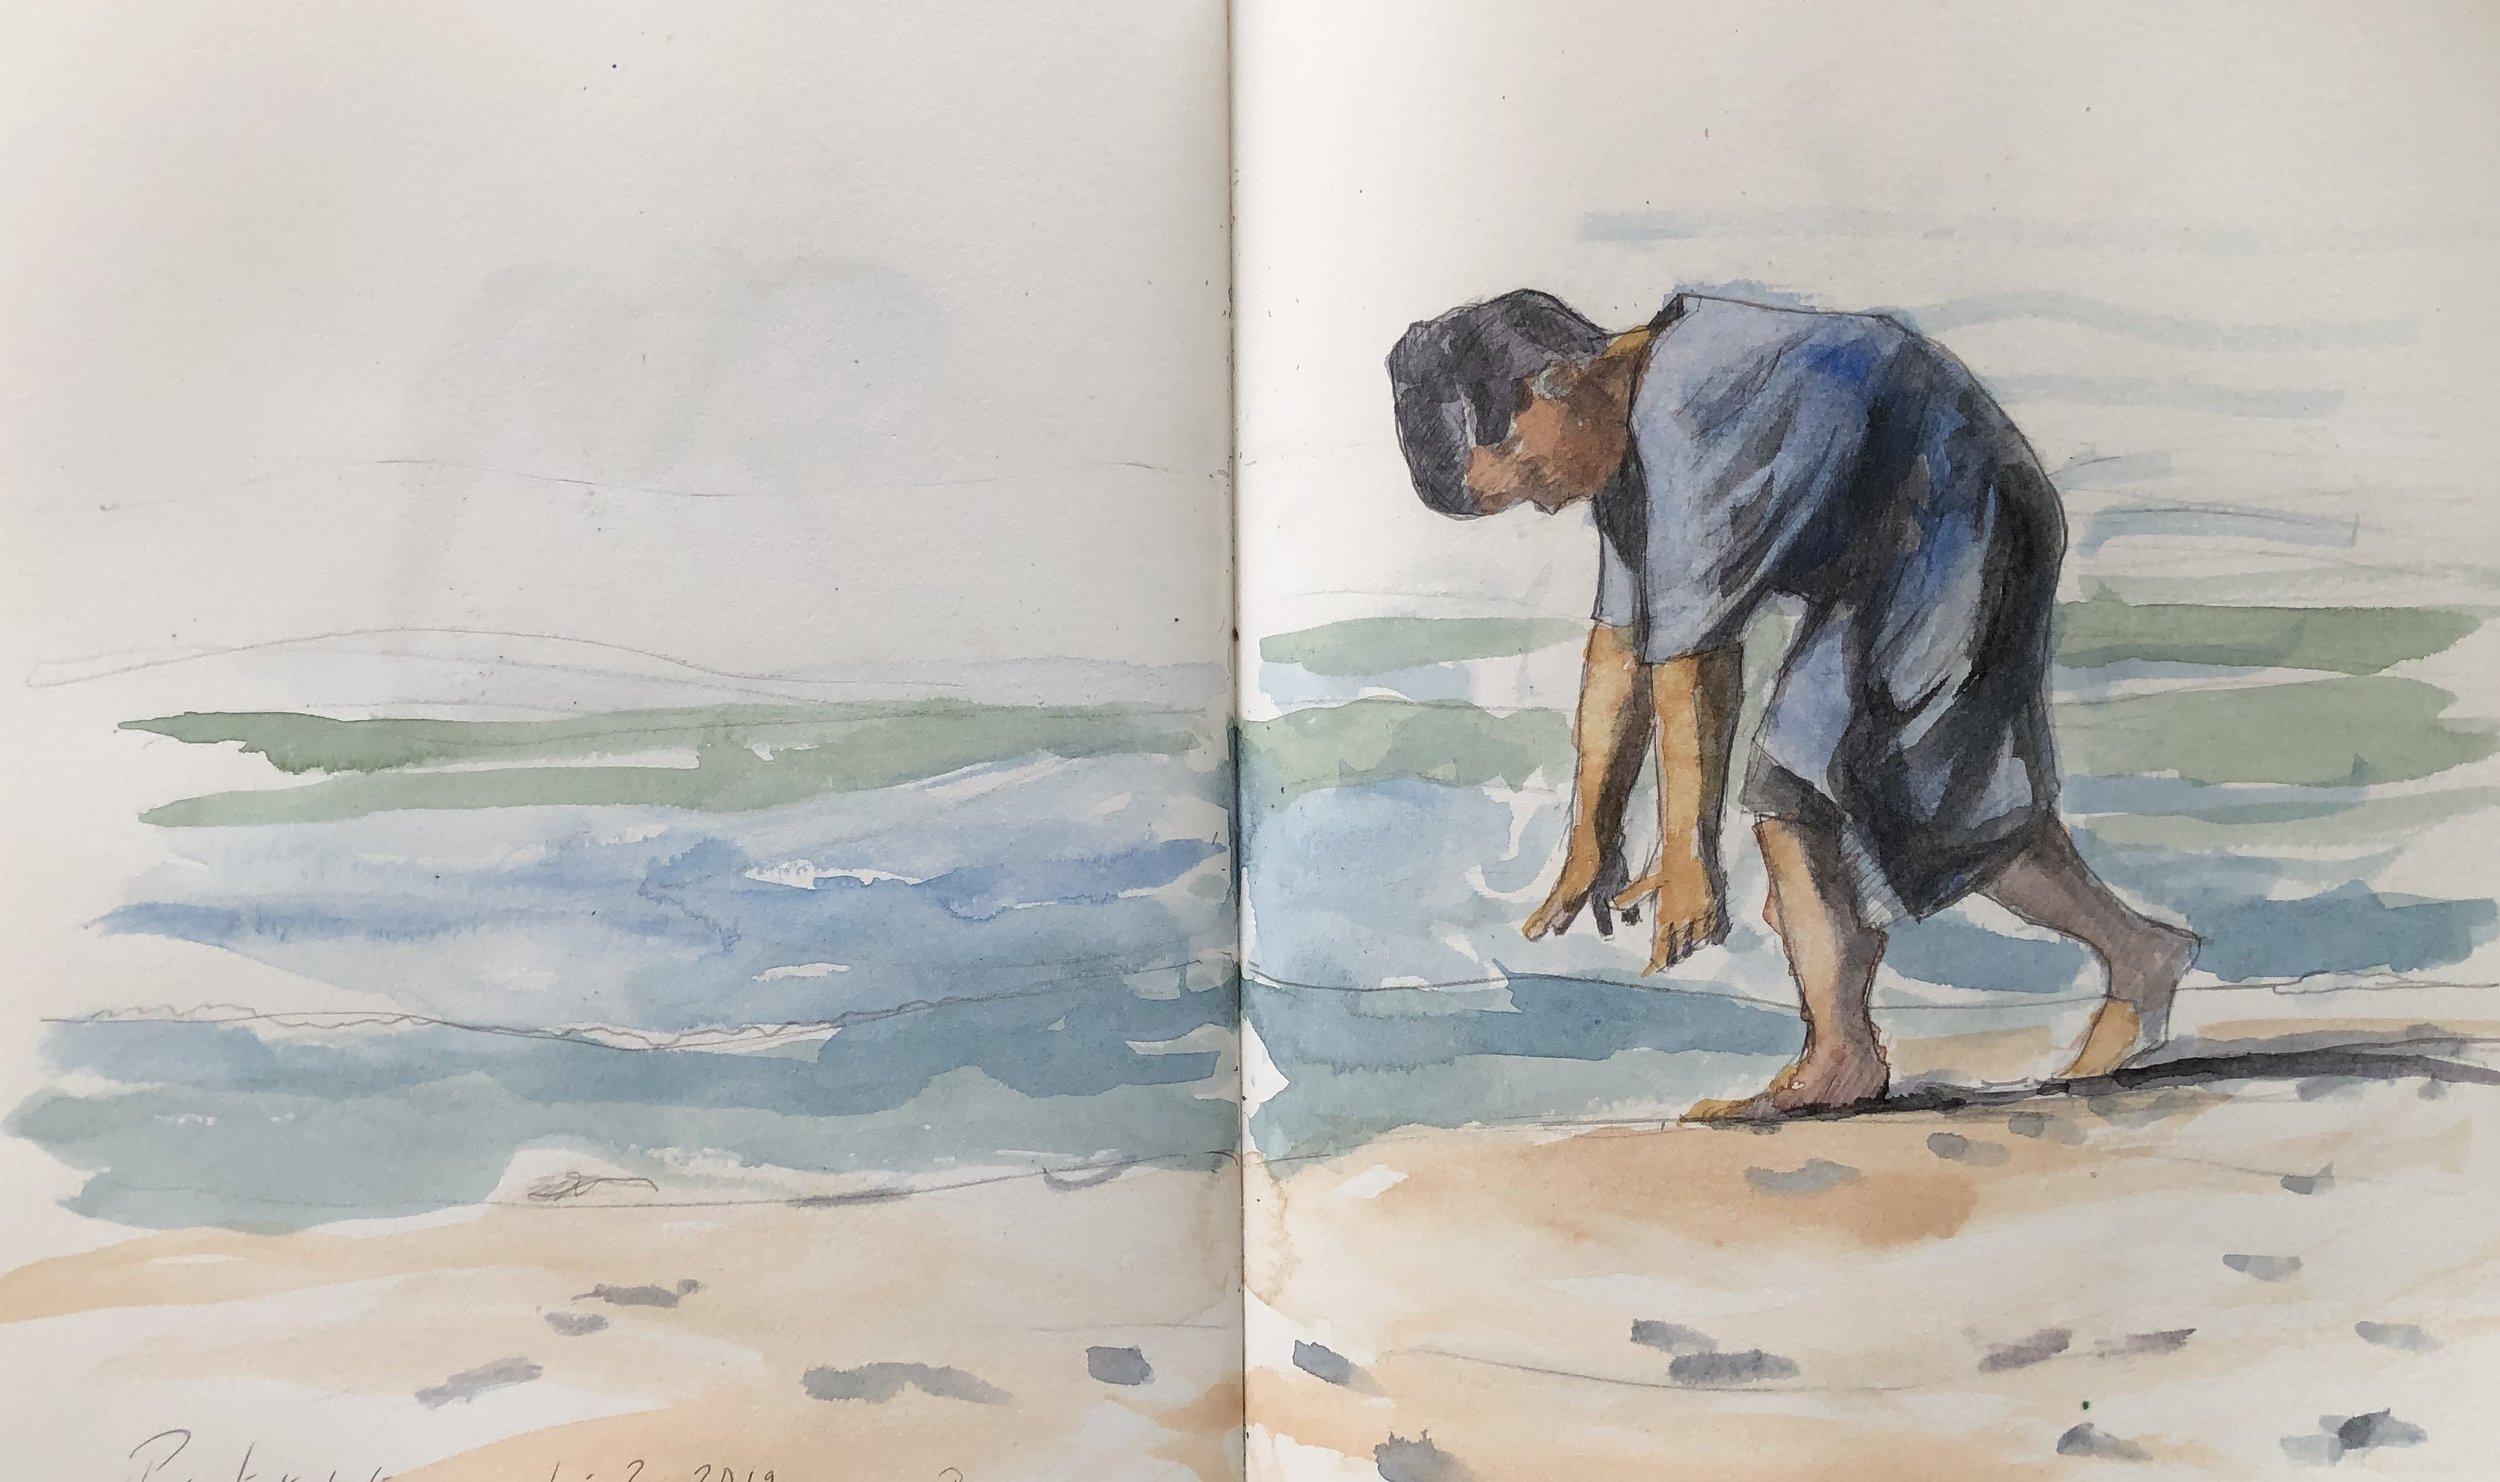 Florida Beach Sketch